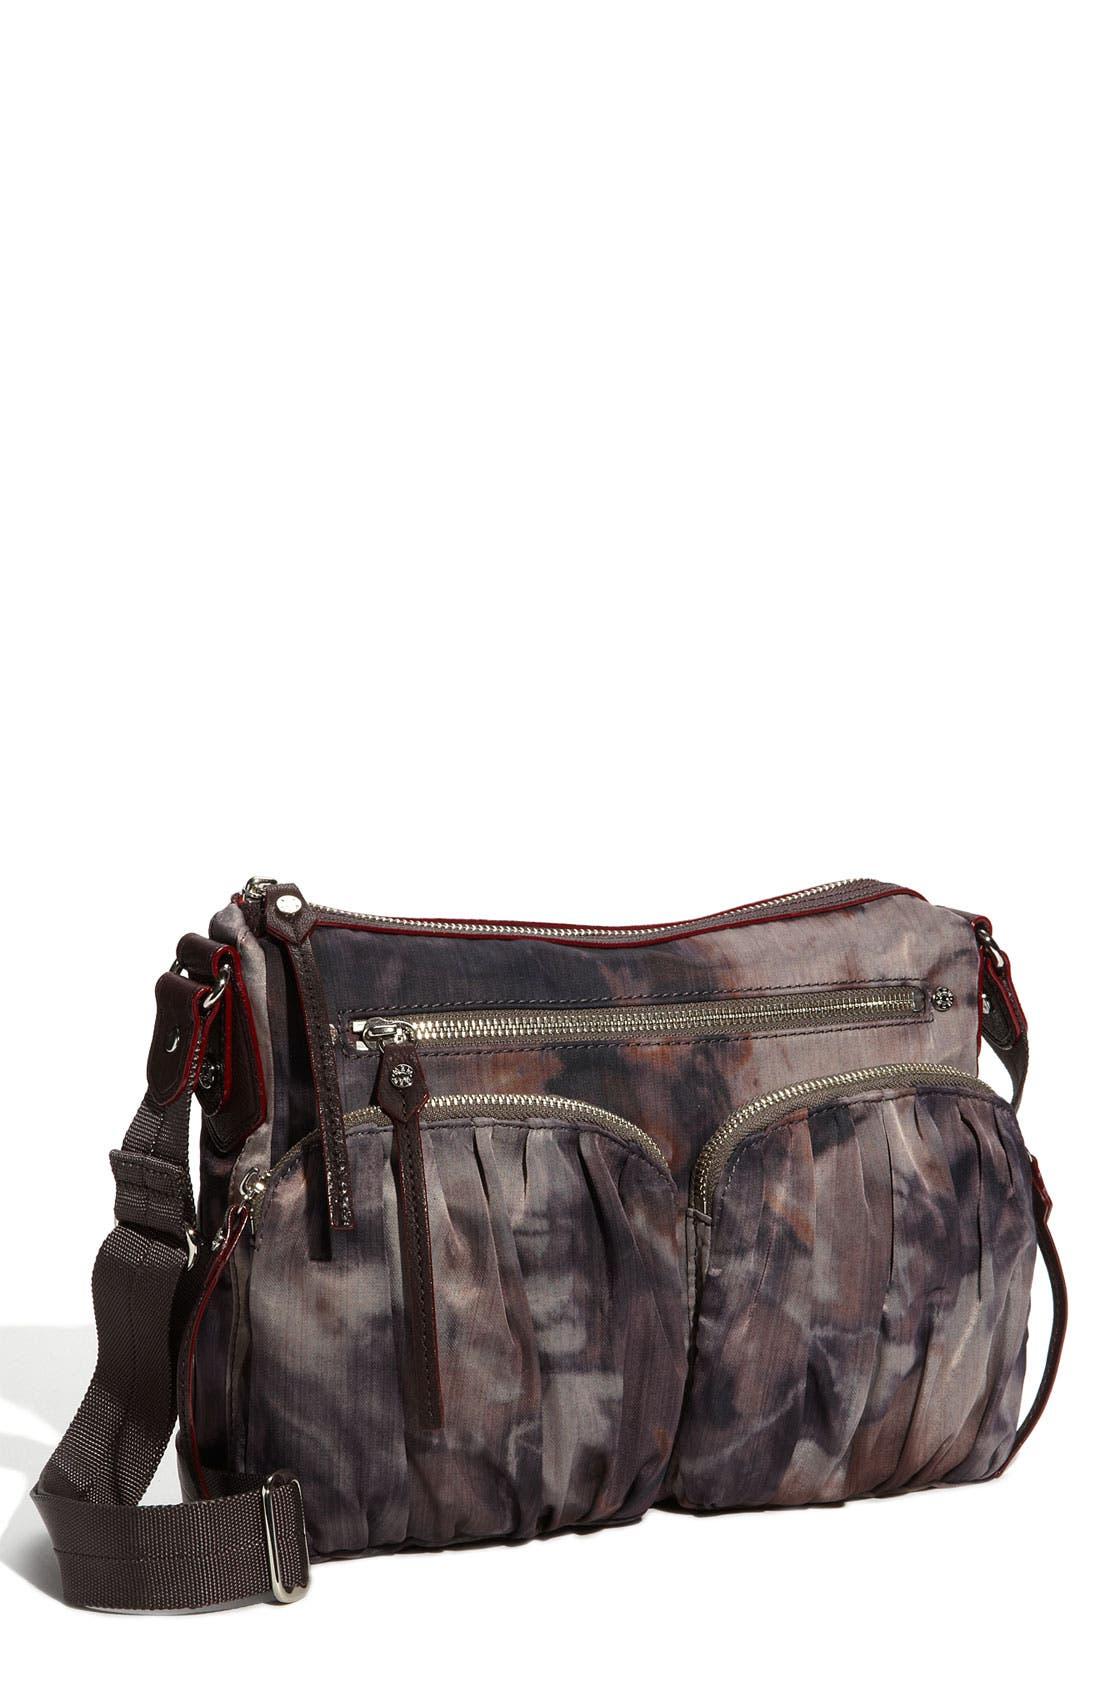 'Paige - Night Storm' Crossbody Bag,                             Main thumbnail 1, color,                             500